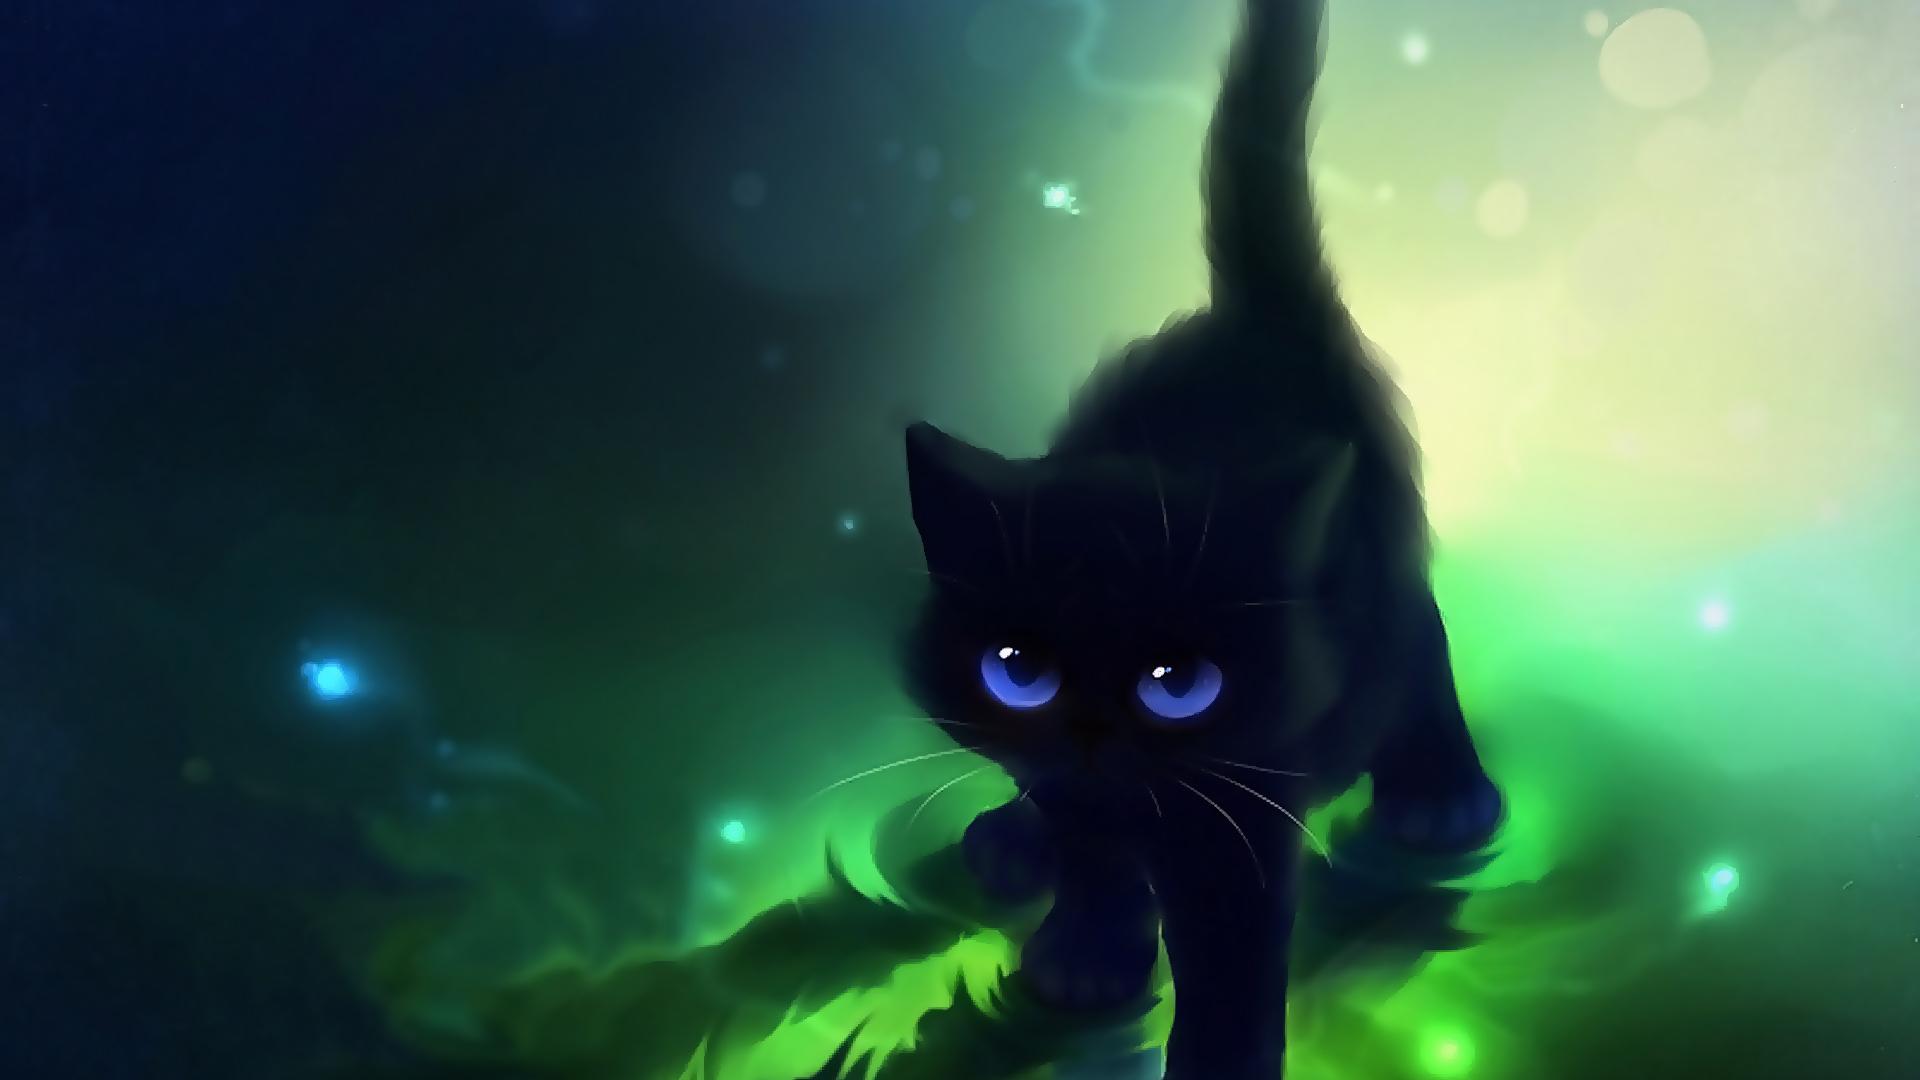 Free Download Cute Black Cat Cartoon Cute Black Cat Blue Eyes Cute Cat Drawing 1920x1483 For Your Desktop Mobile Tablet Explore 48 Black Cat Wallpaper Drawings Cats Wallpaper Cat